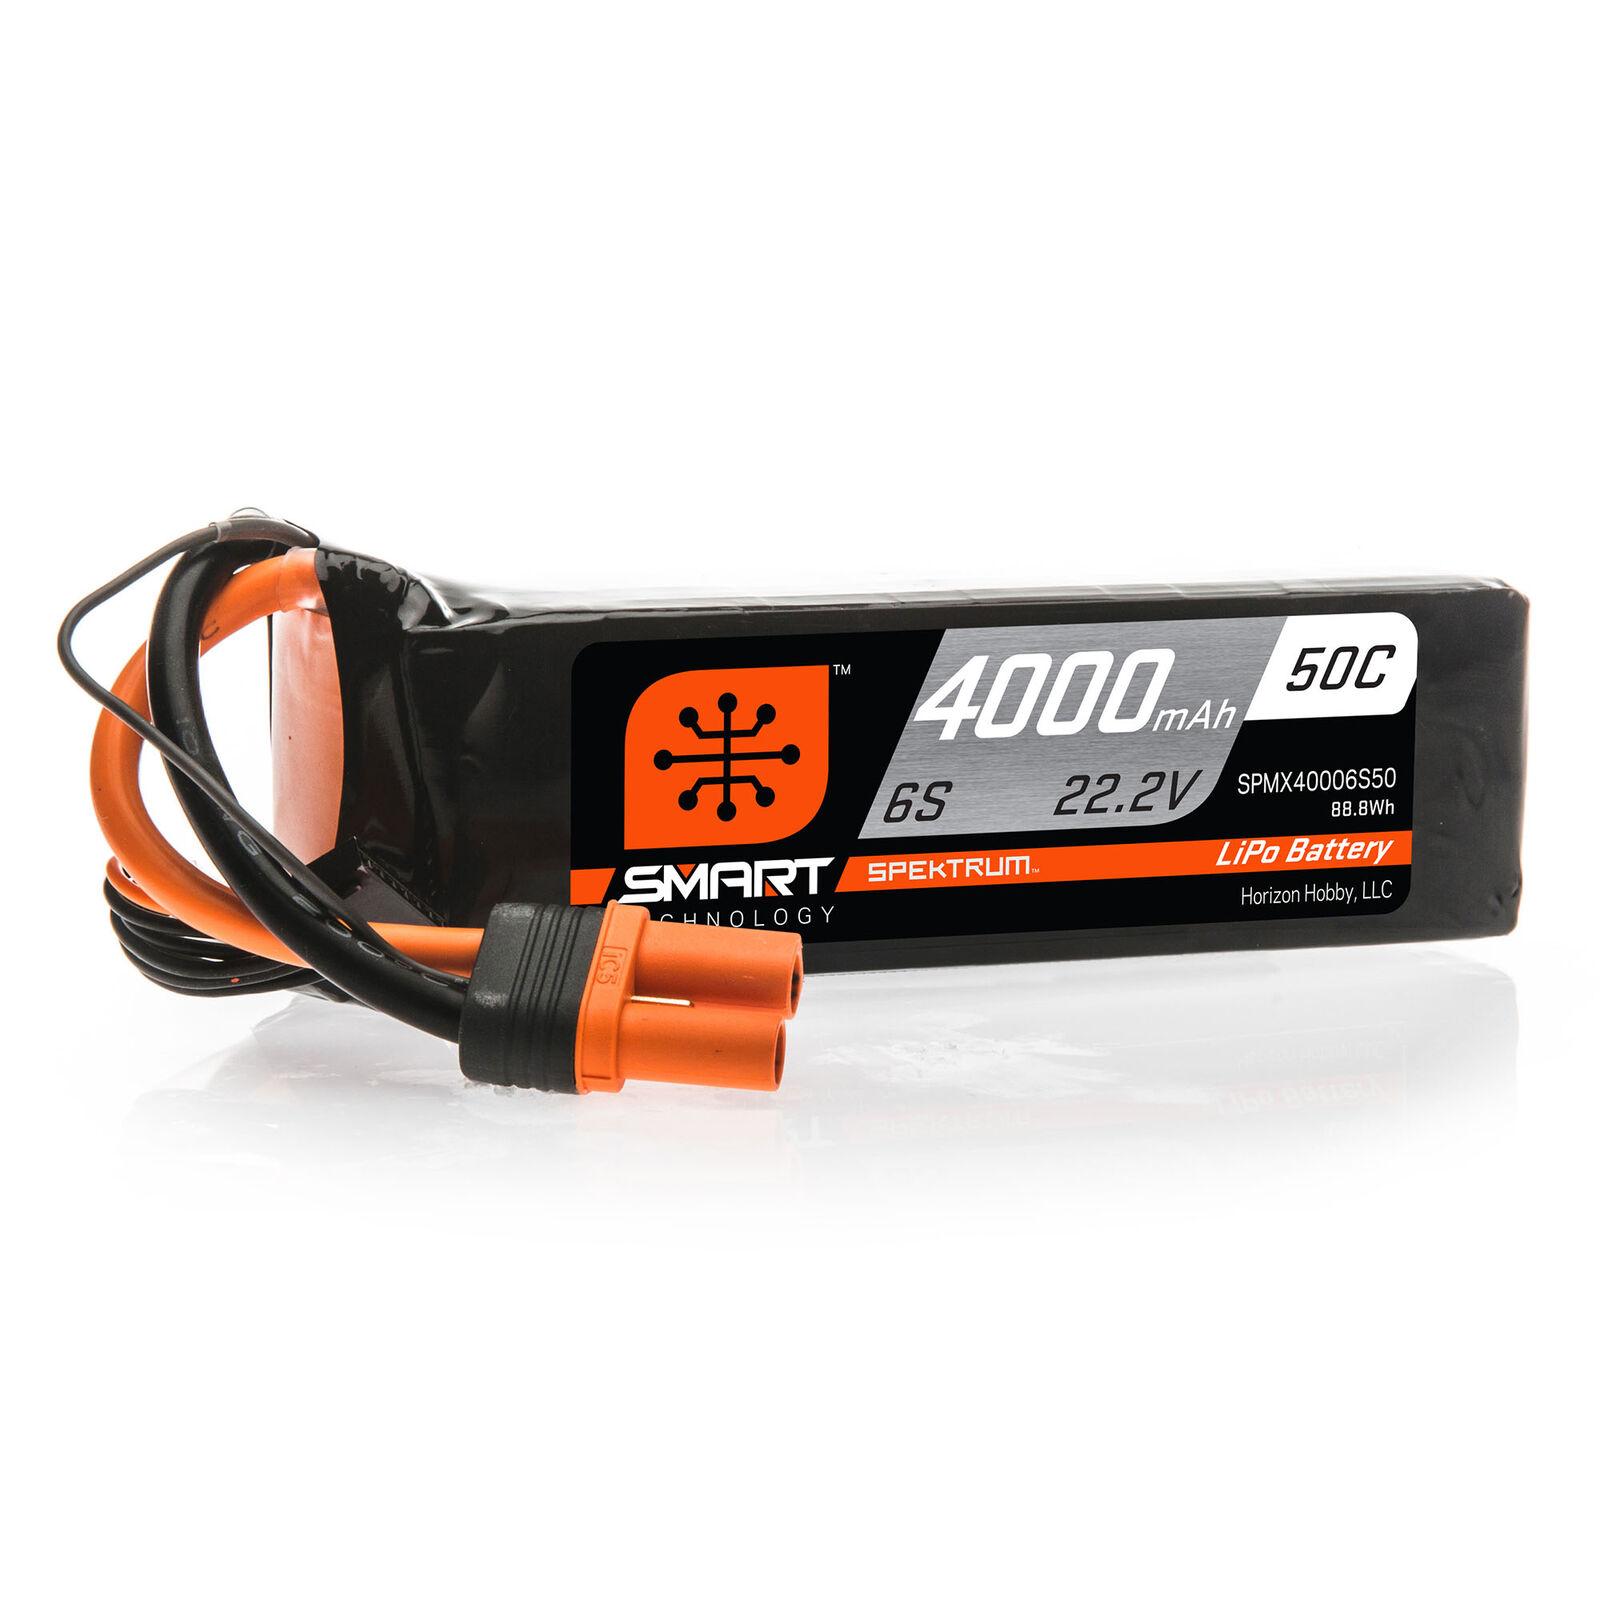 22.2V 4000mAh 6S 50C Smart LiPo Battery: IC5